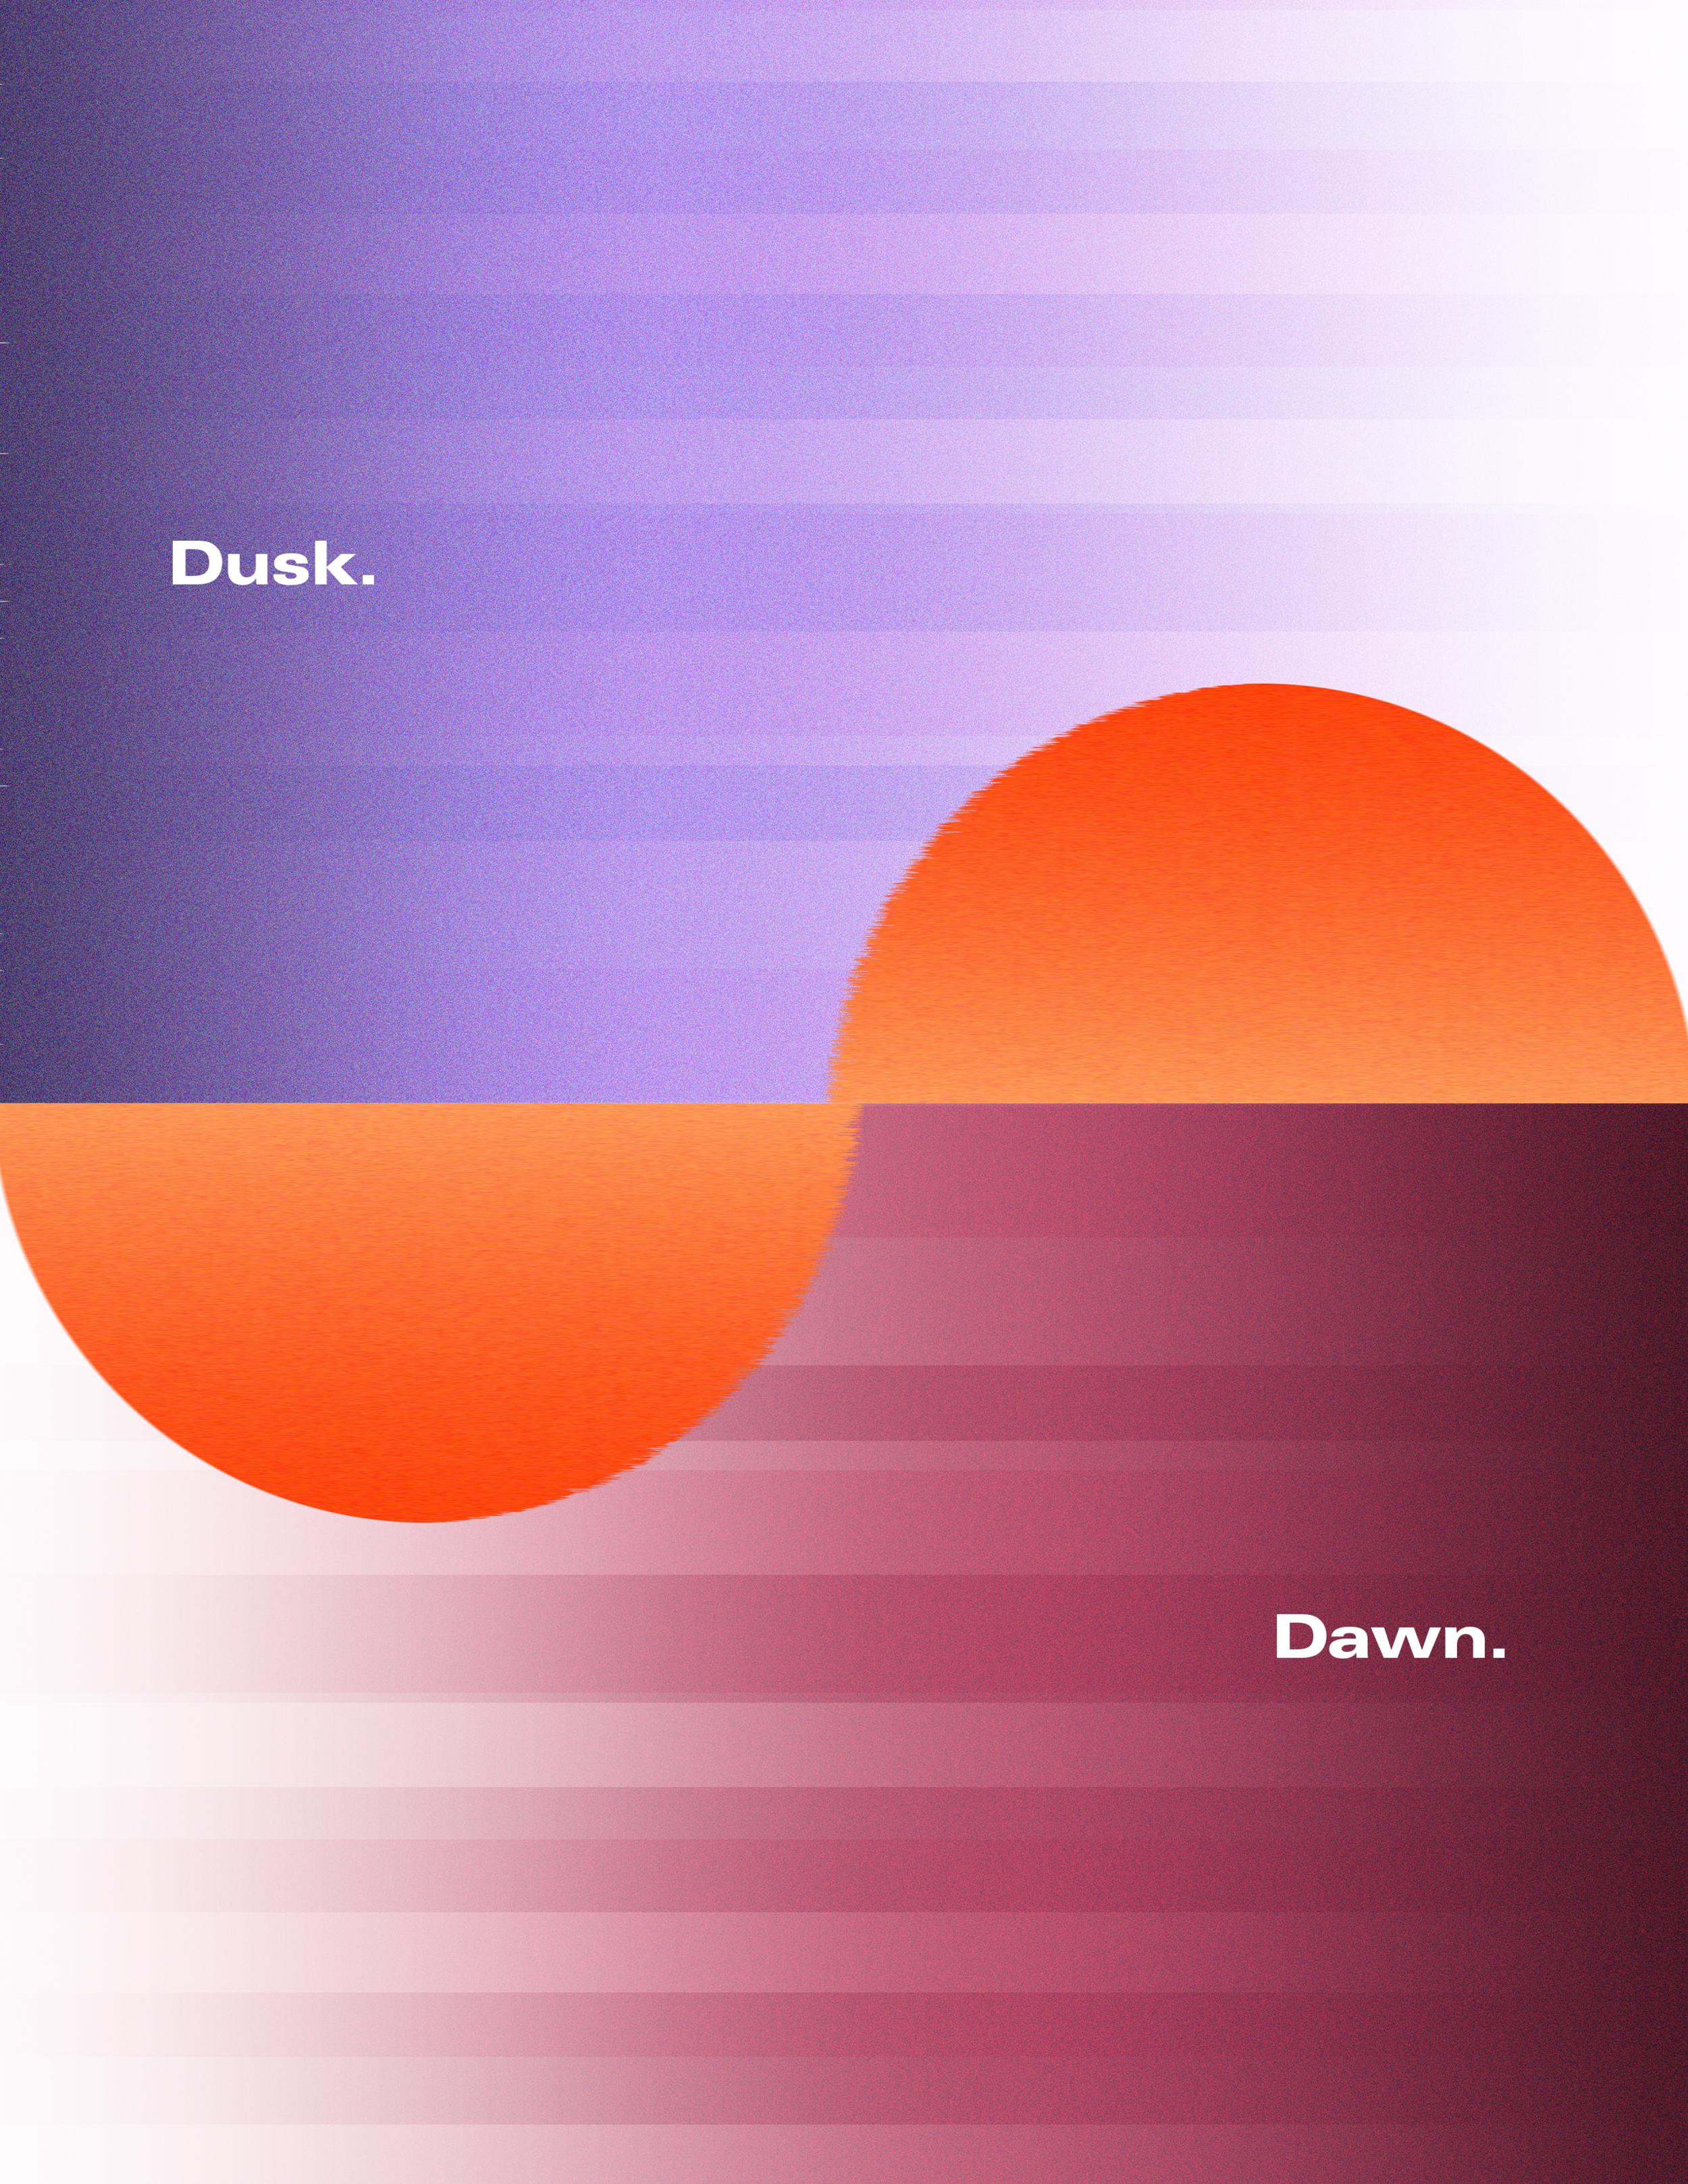 dusk2dawn.png